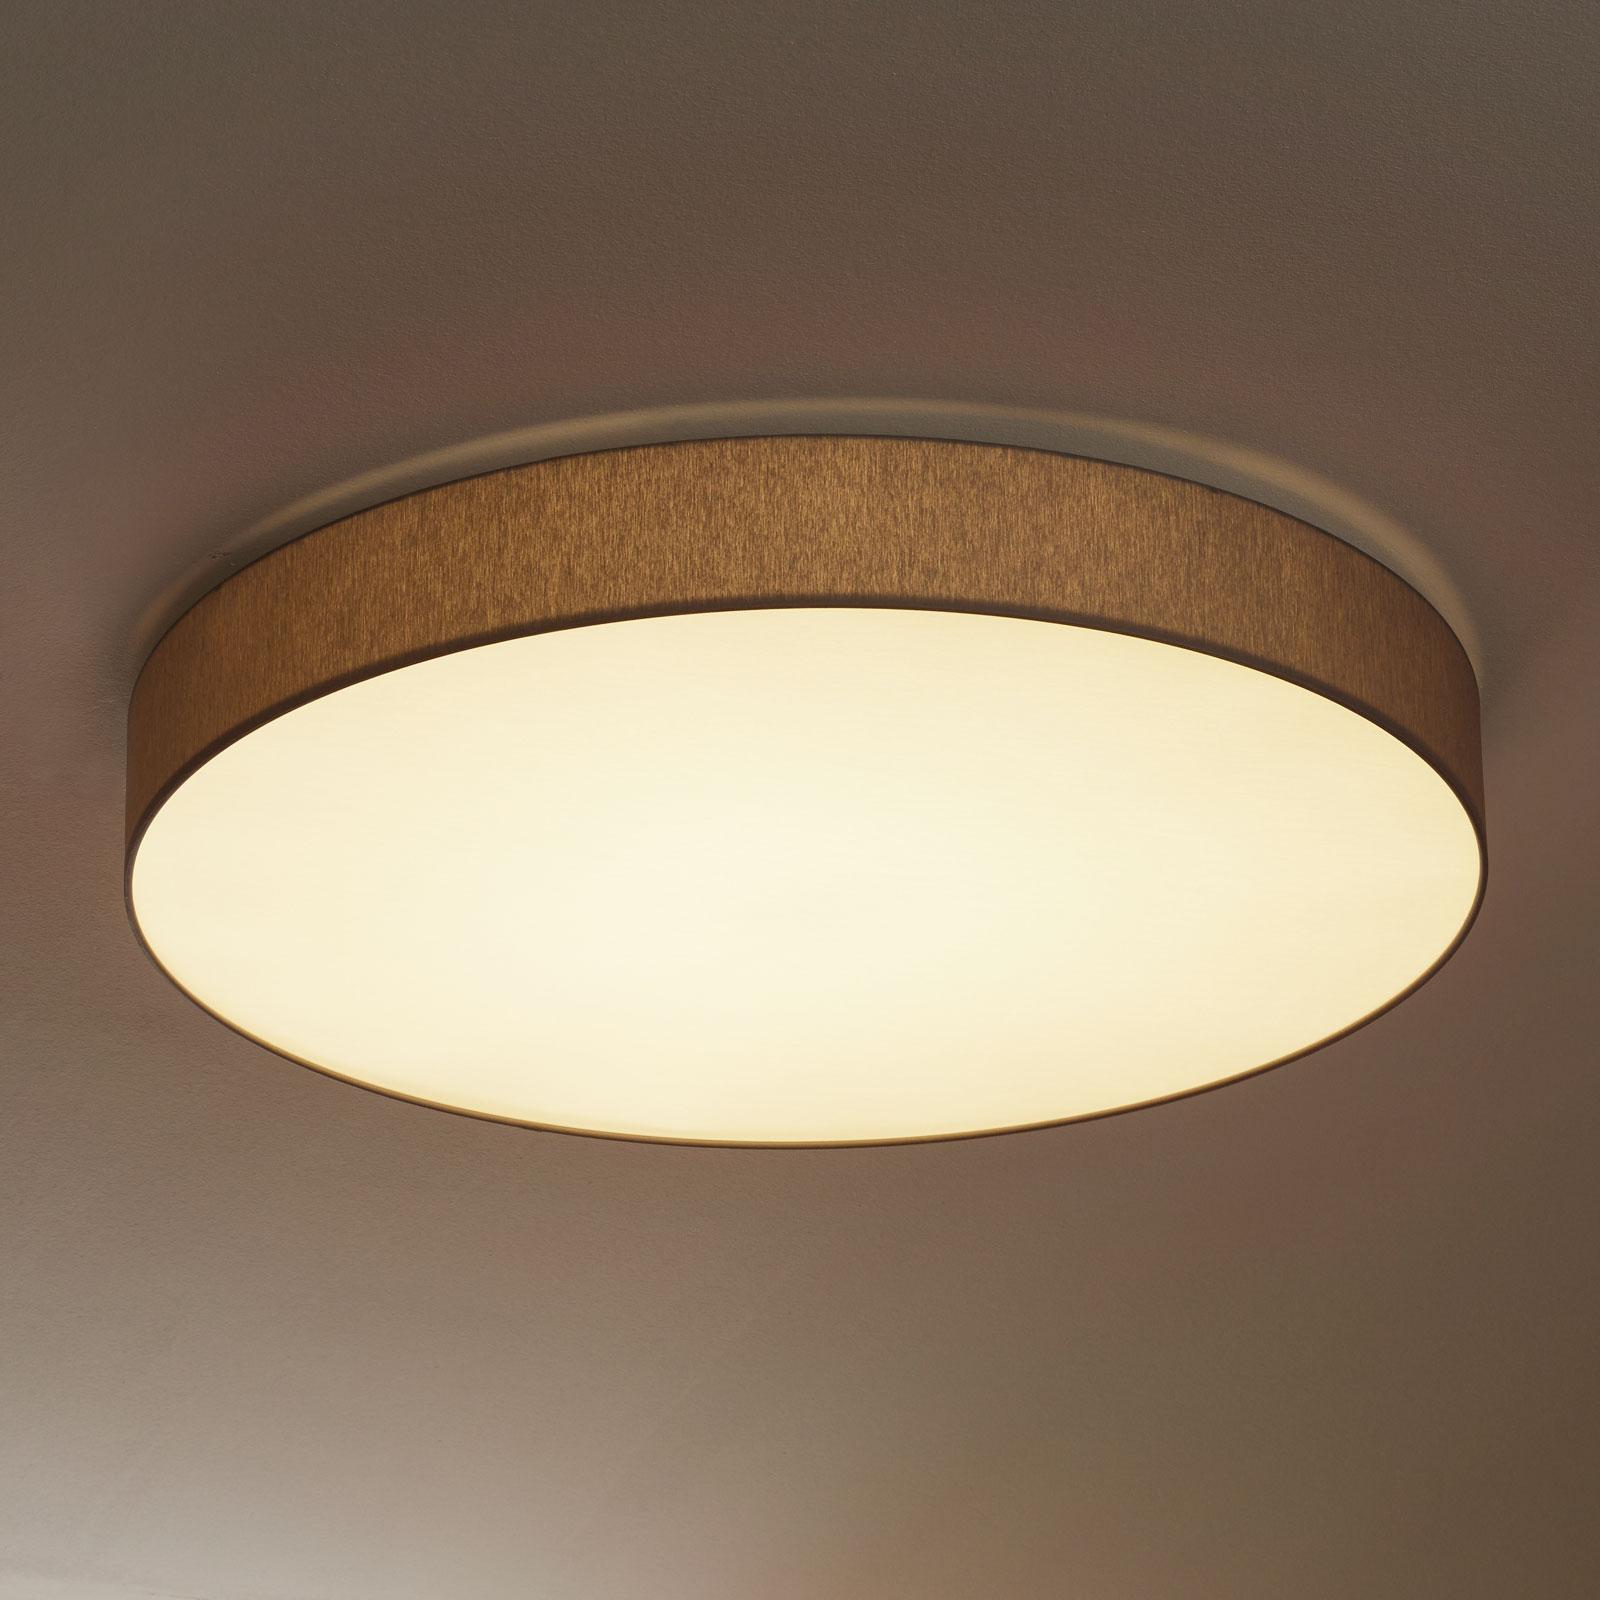 Ronde LED plafondlamp Luno met dimfunctie